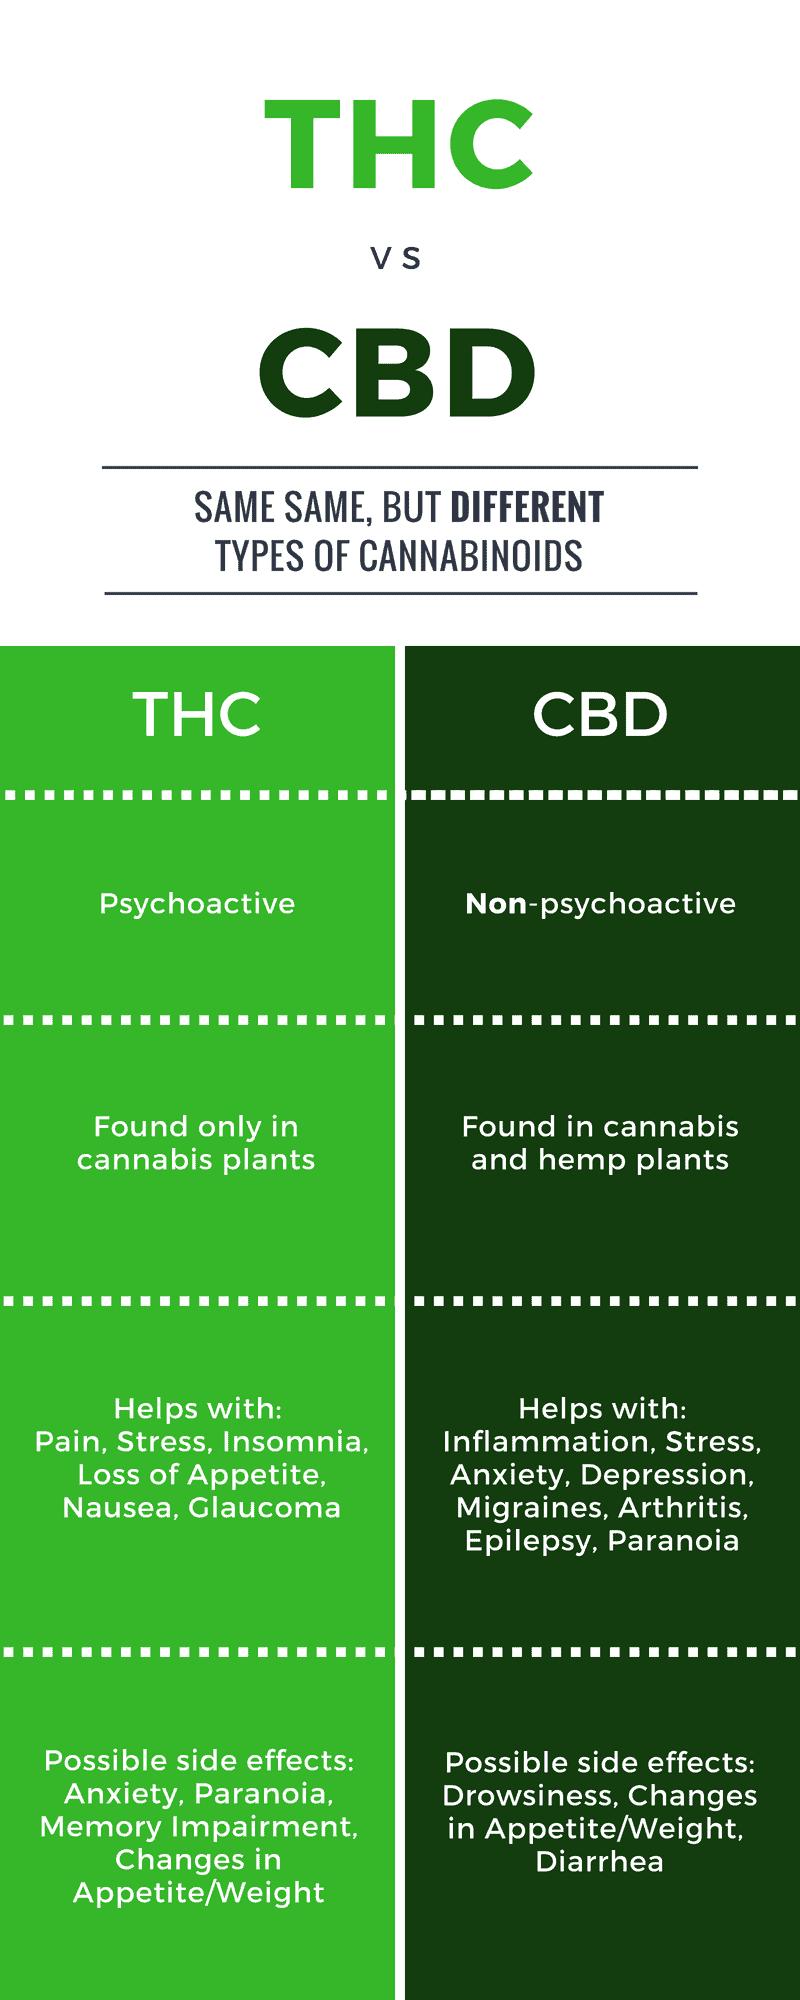 THC vs CBD: The ultimate guide